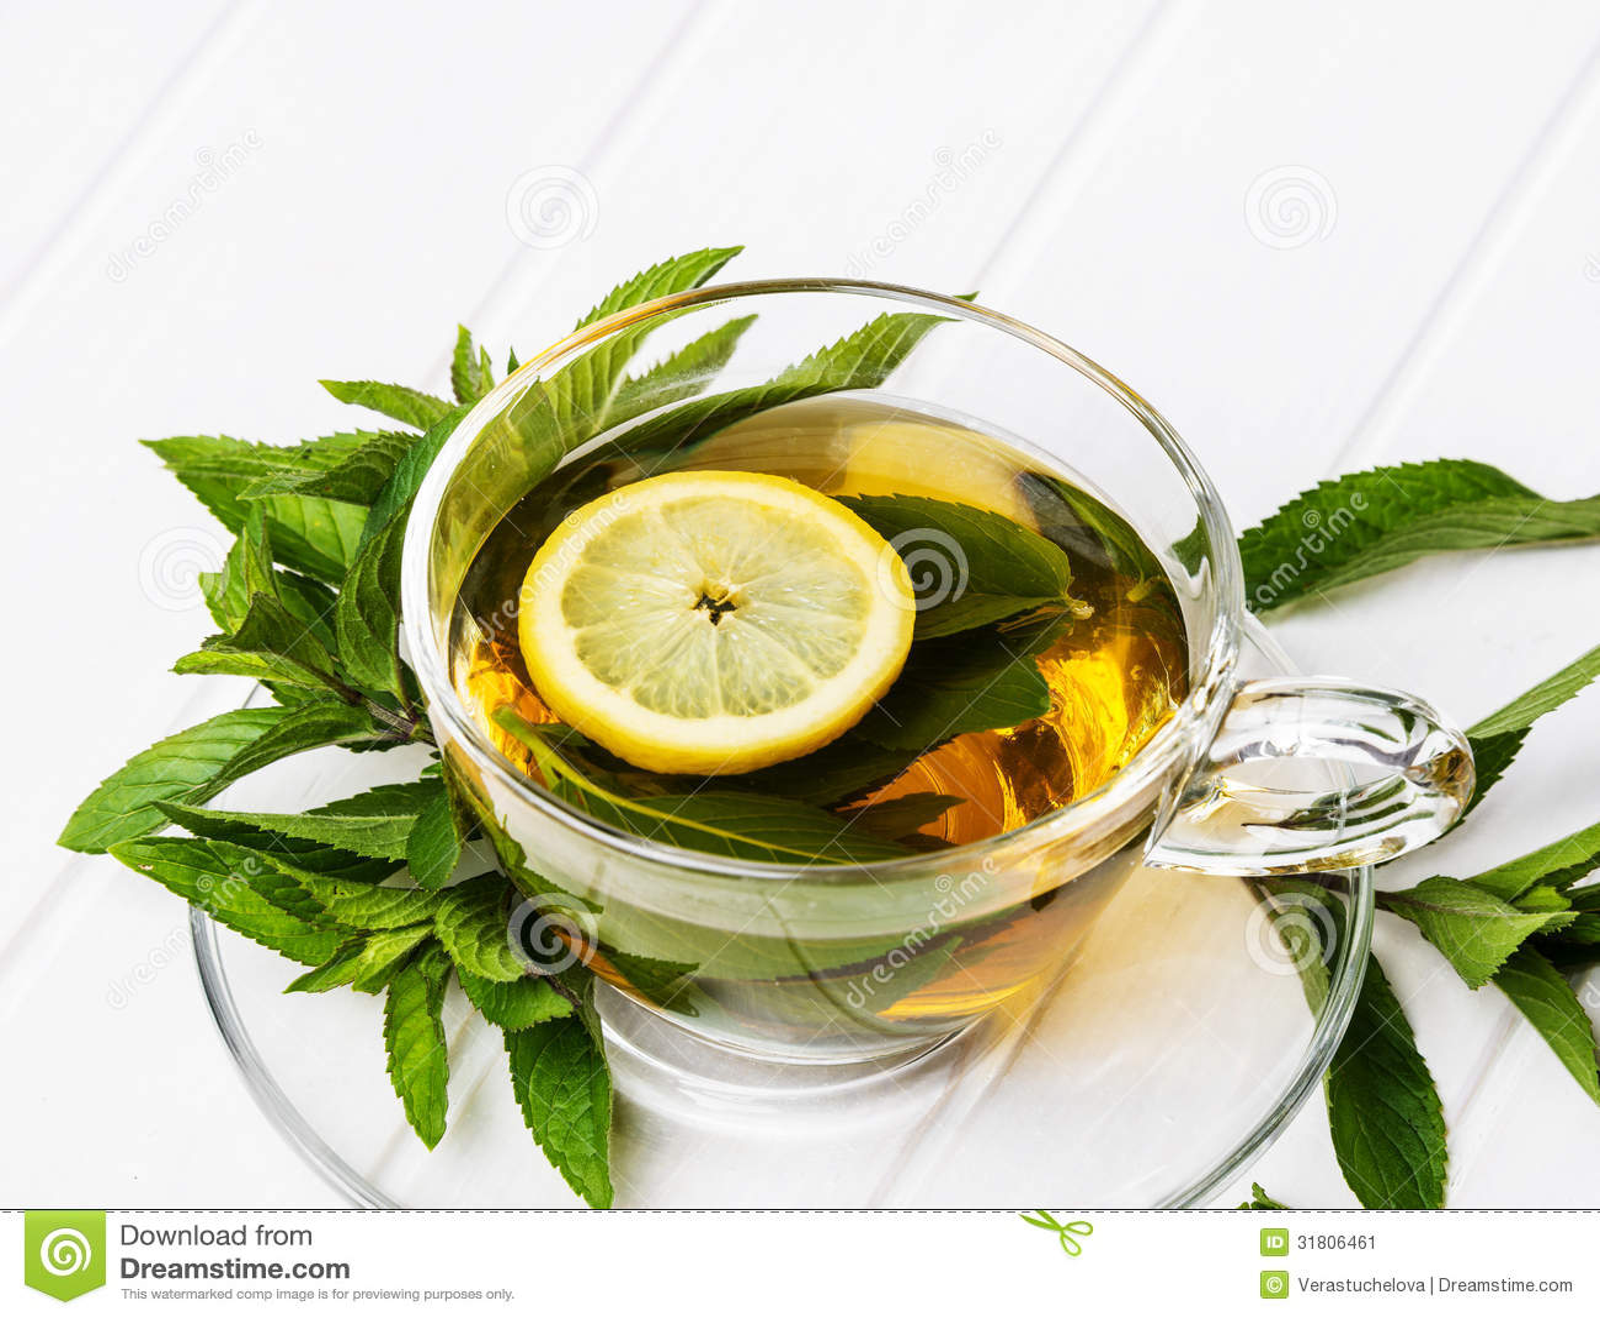 Fresh Mint Tea Stock Image - Image: 31806461